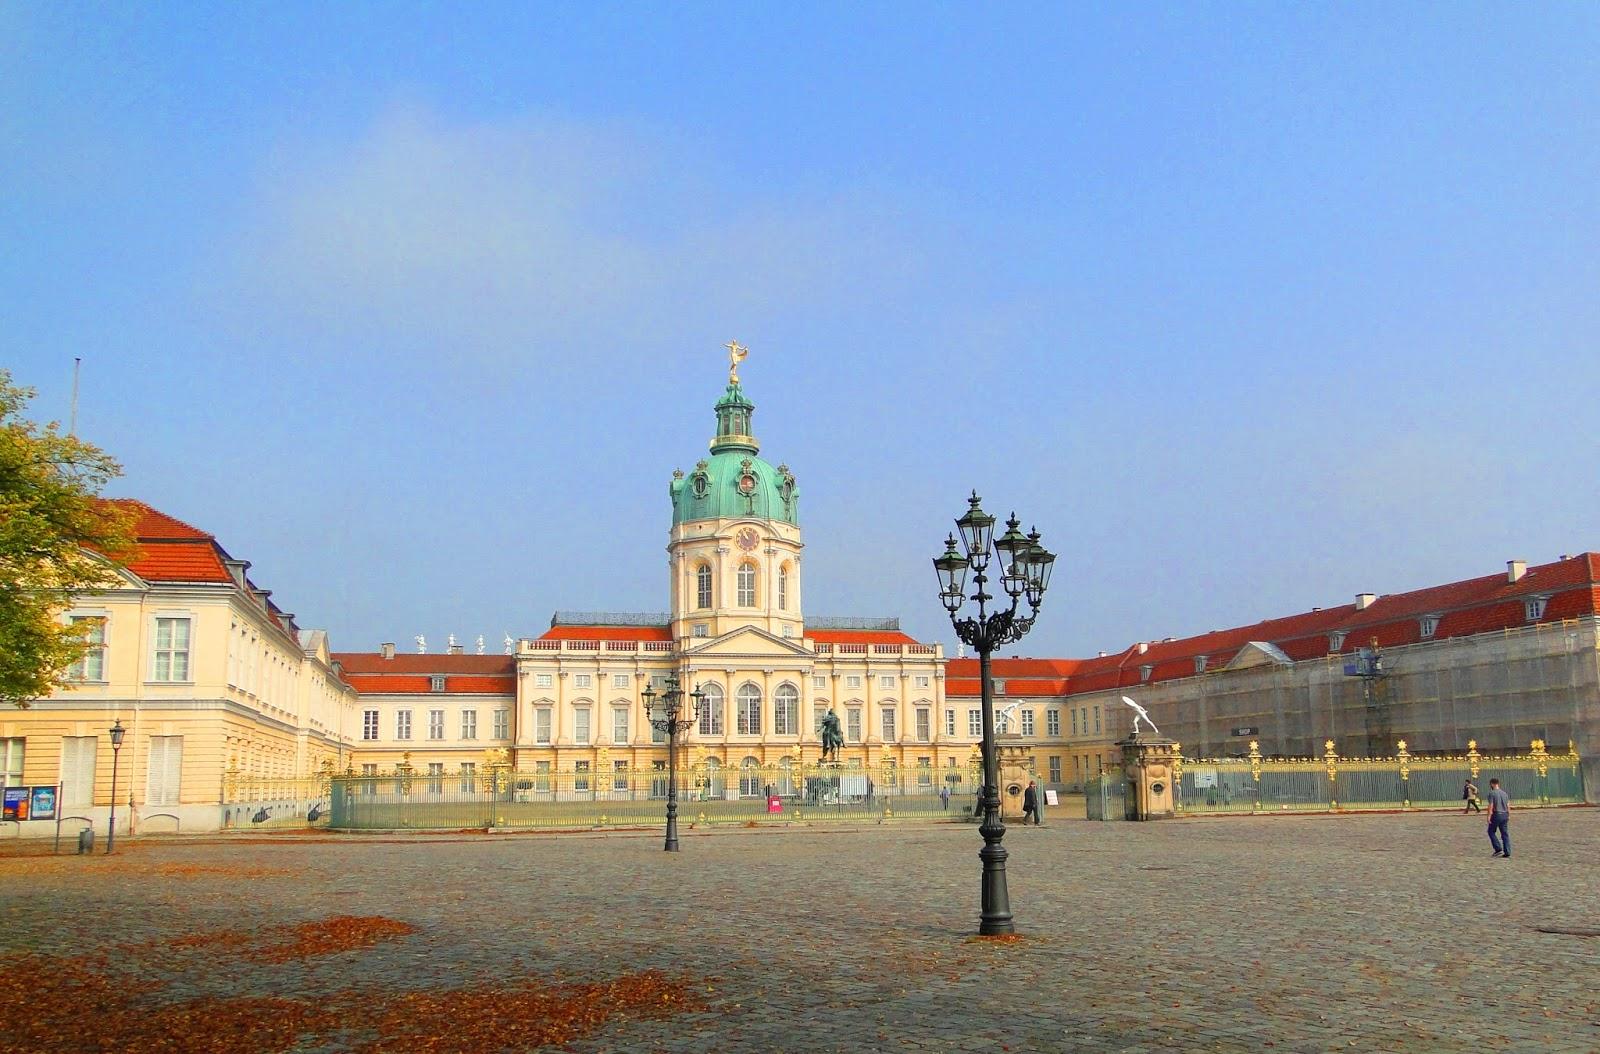 Palácio Charlottenburg em Berlim